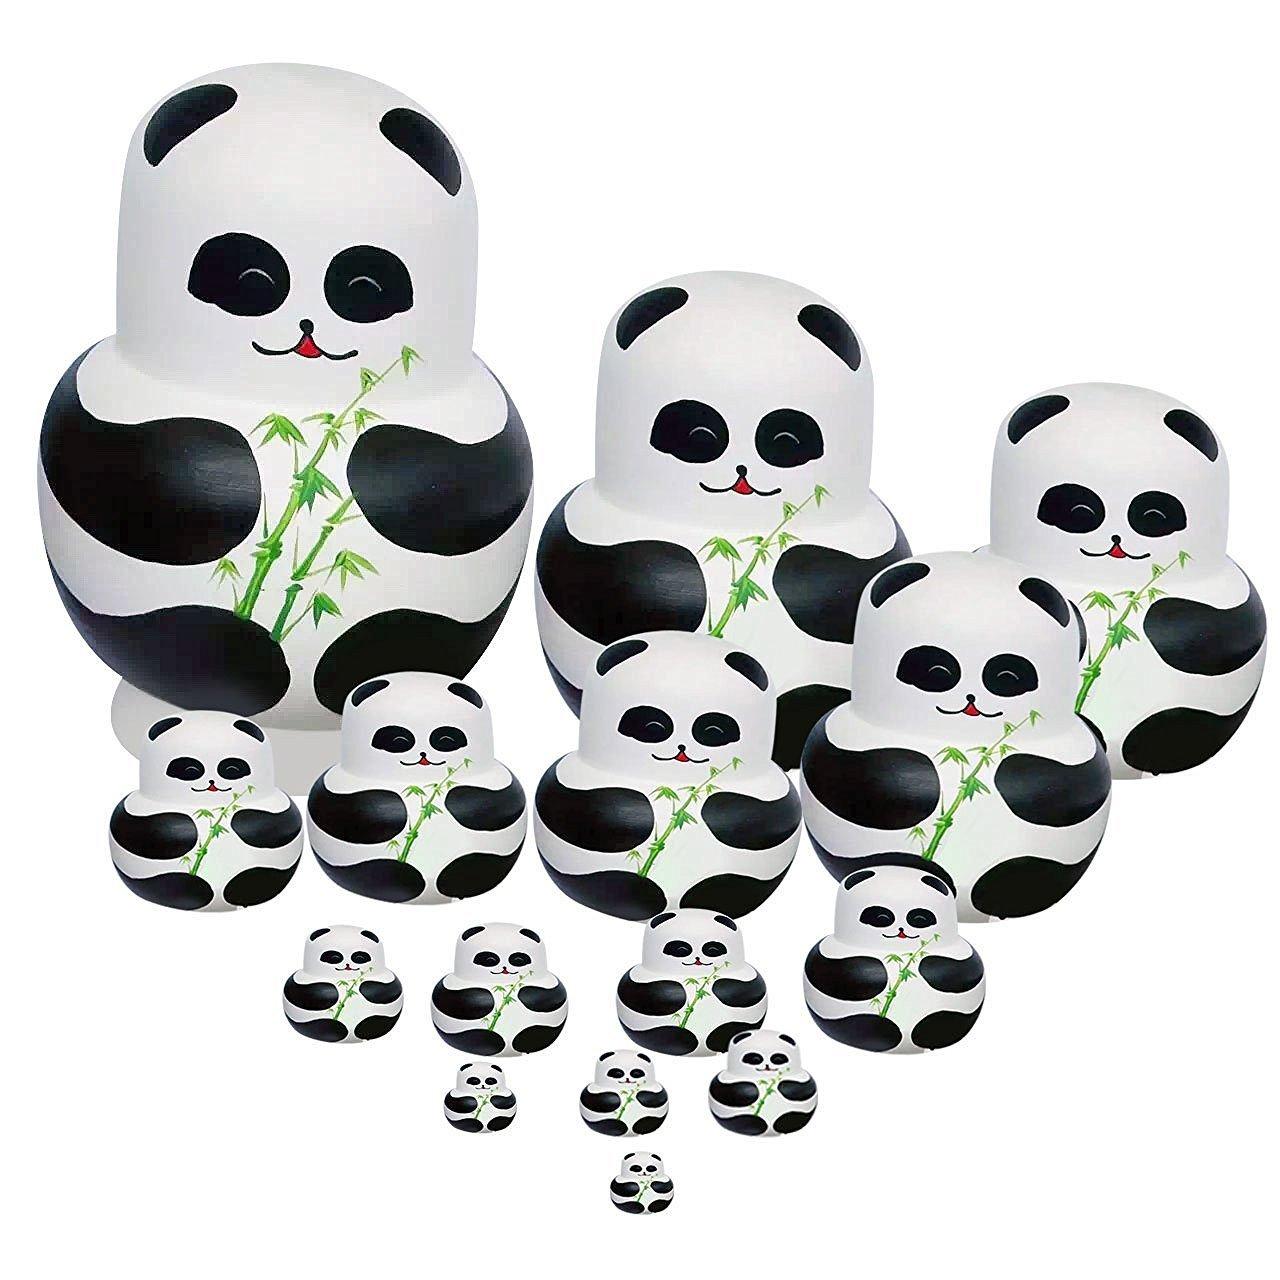 Winterworm Set of 15 Panda with Bamboo Nesting Dolls Matryoshka Russian Doll Popular Handmade Kids Girl Gifts Christmas Toy